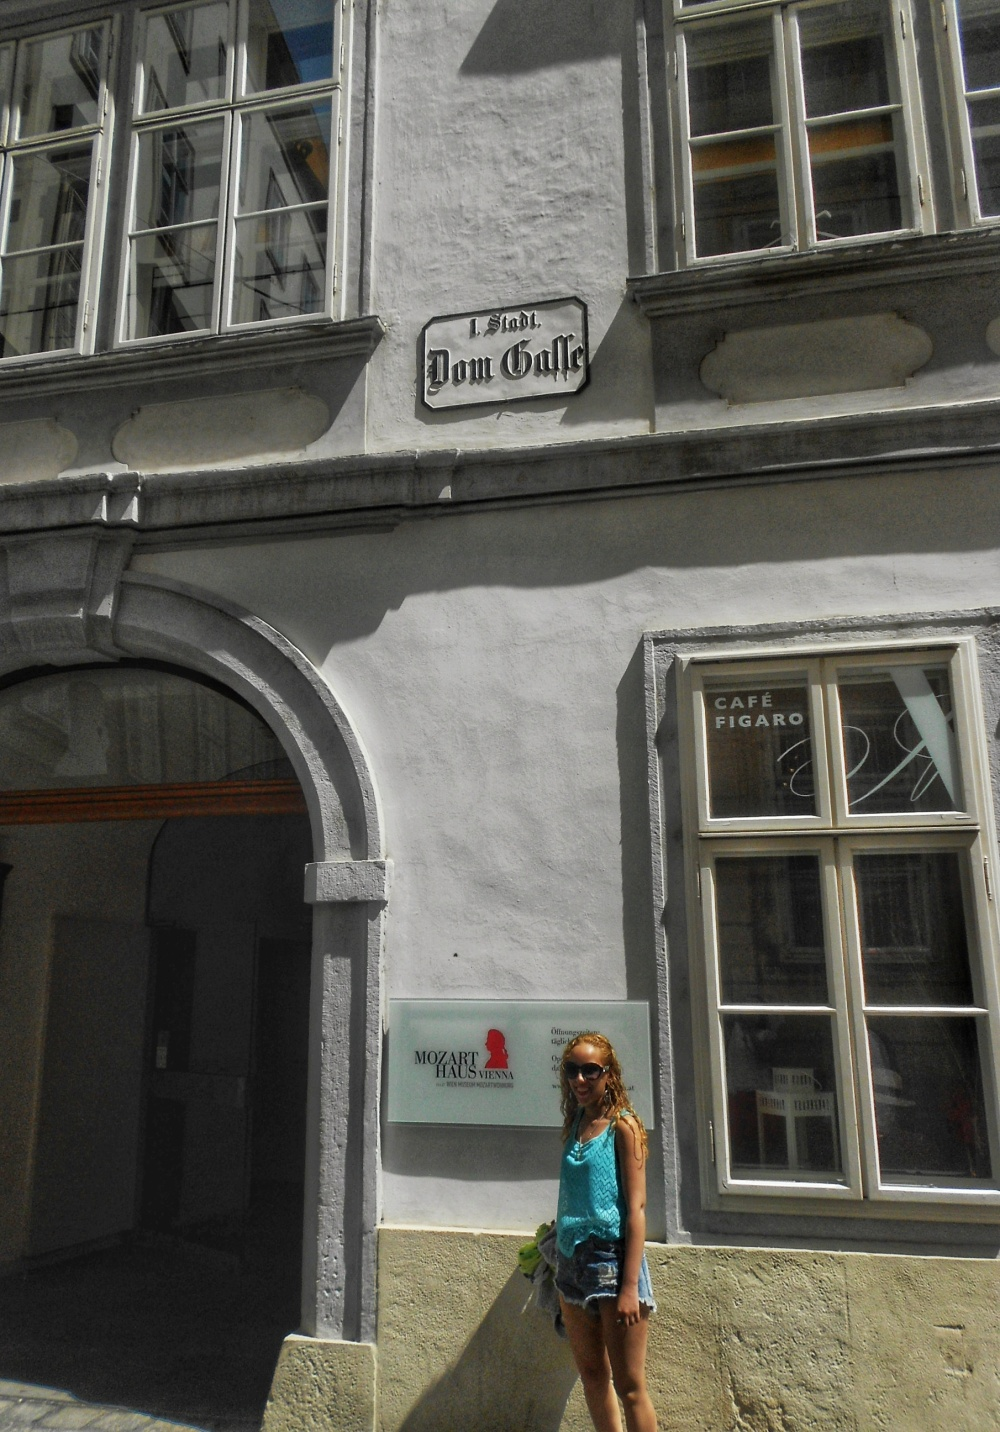 Mozart's house Vienna Austria